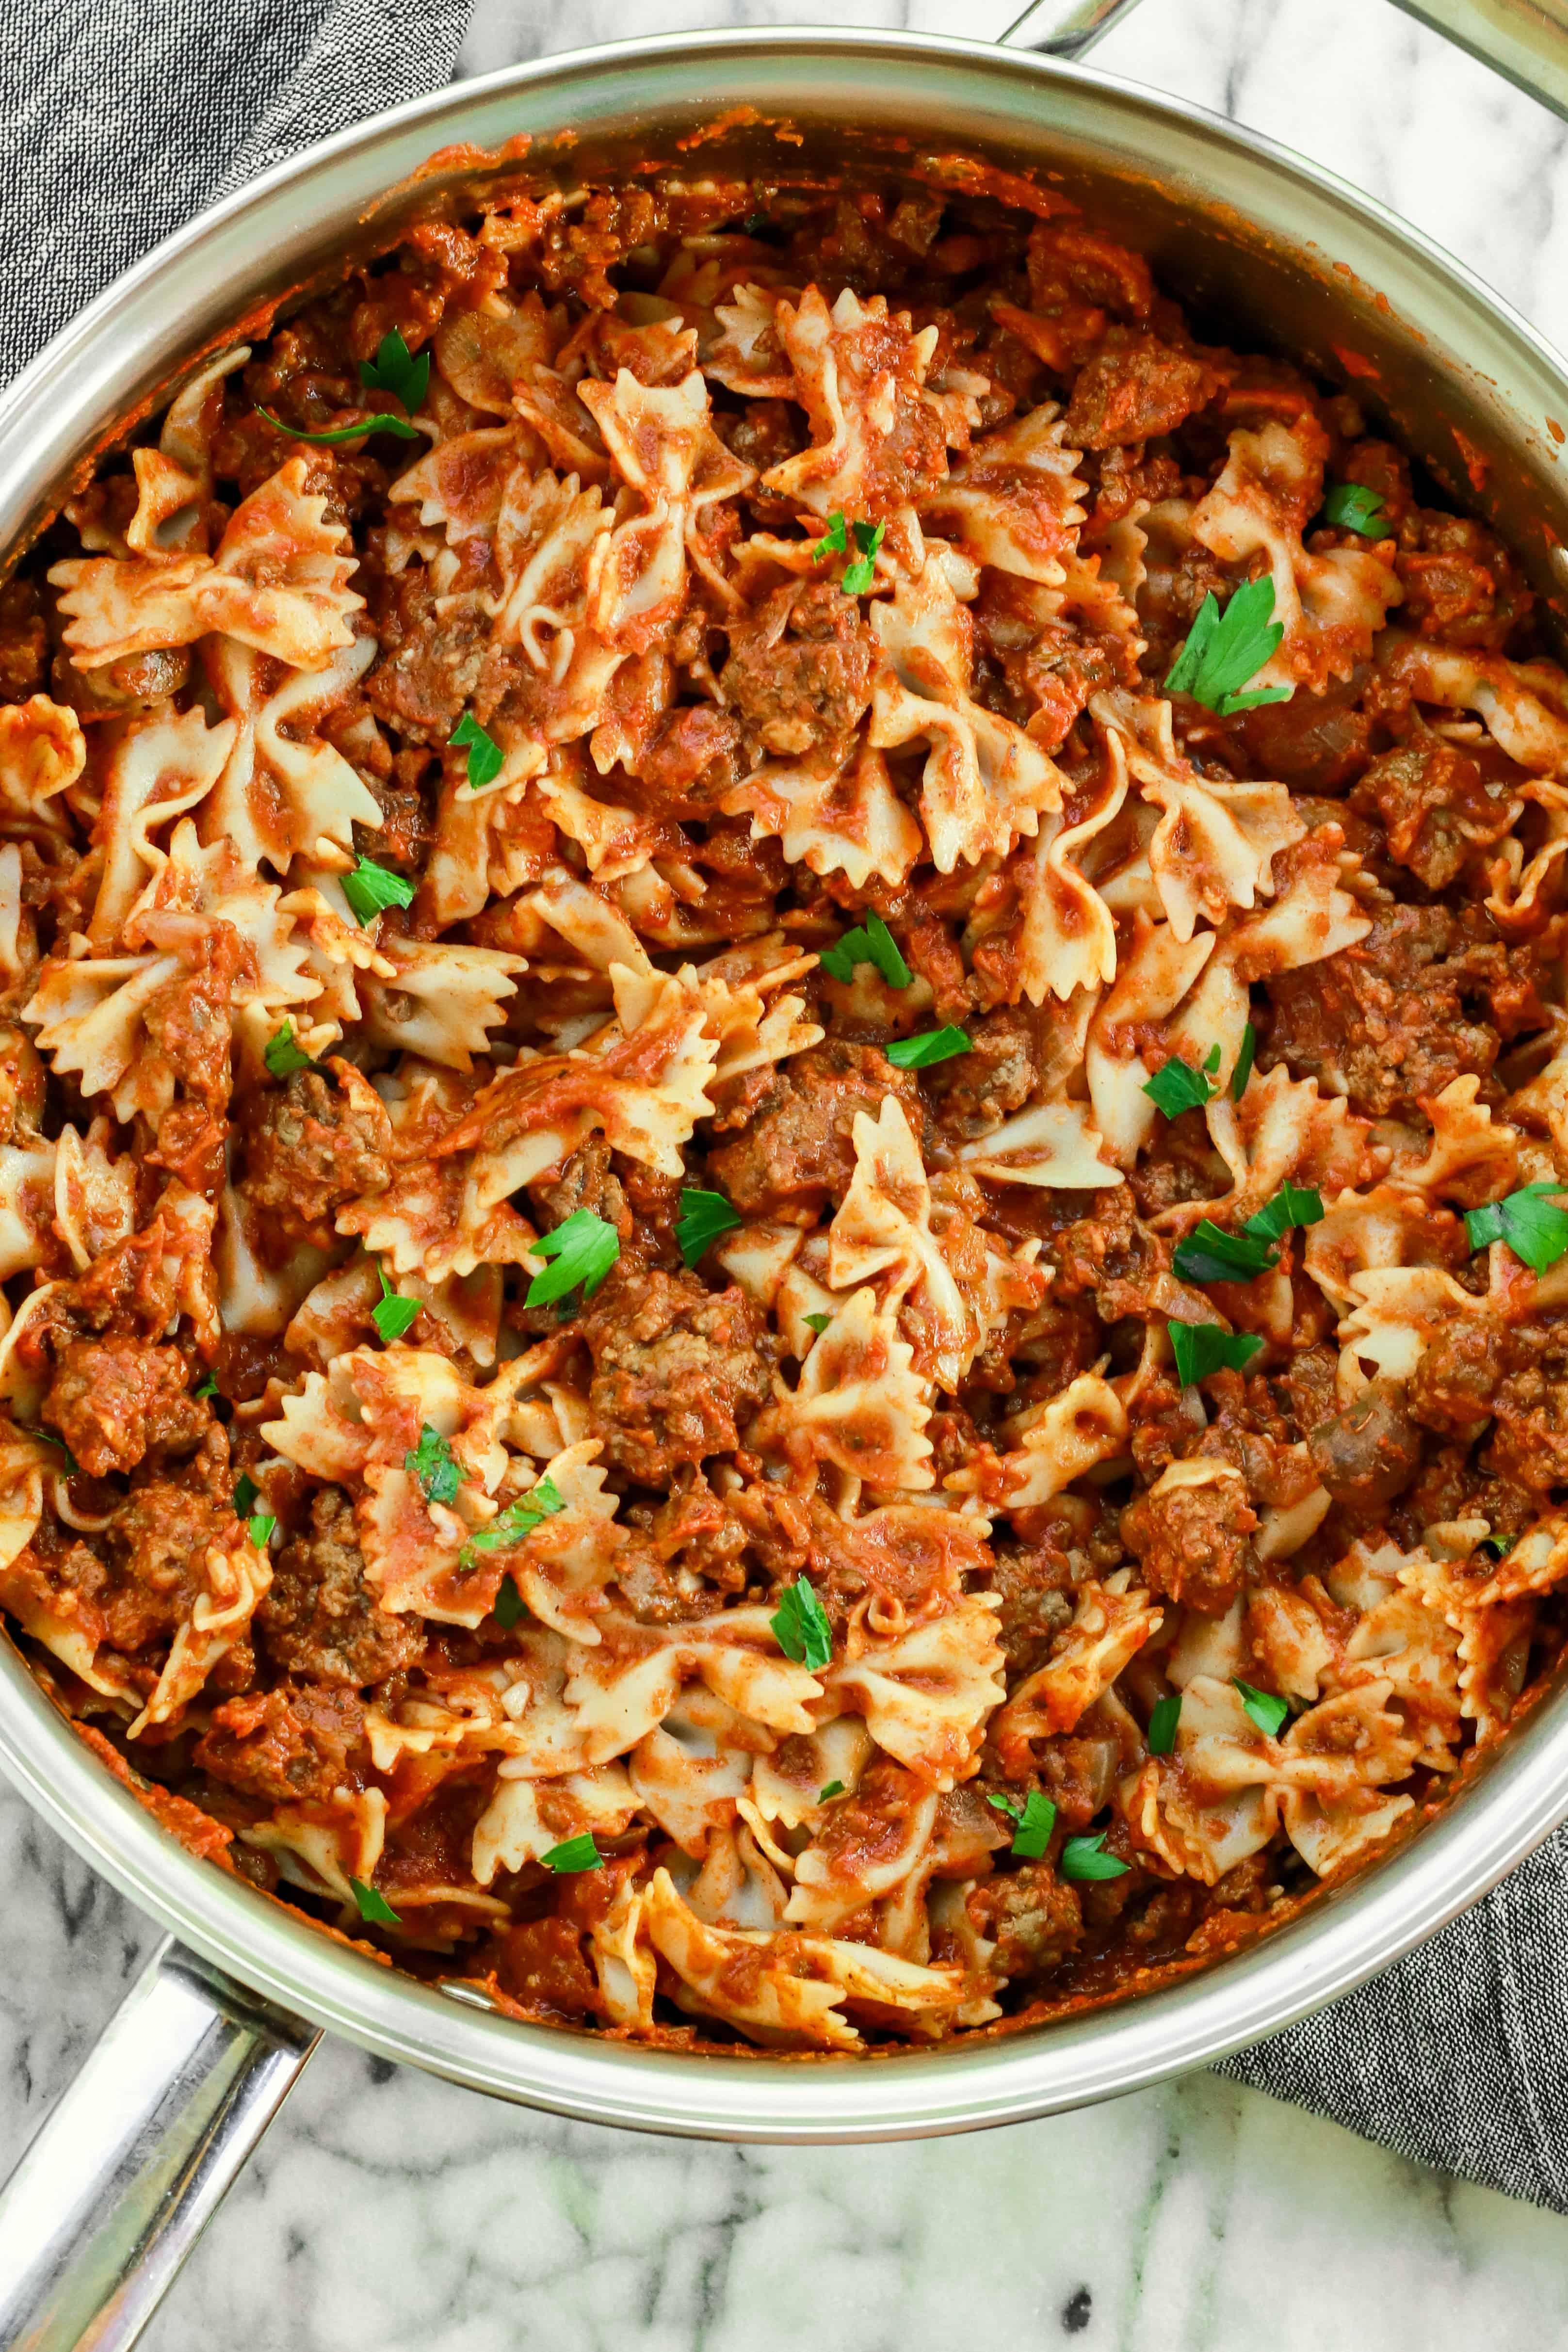 Gluten-Free Pasta with Ground Lamb Meat Sauce